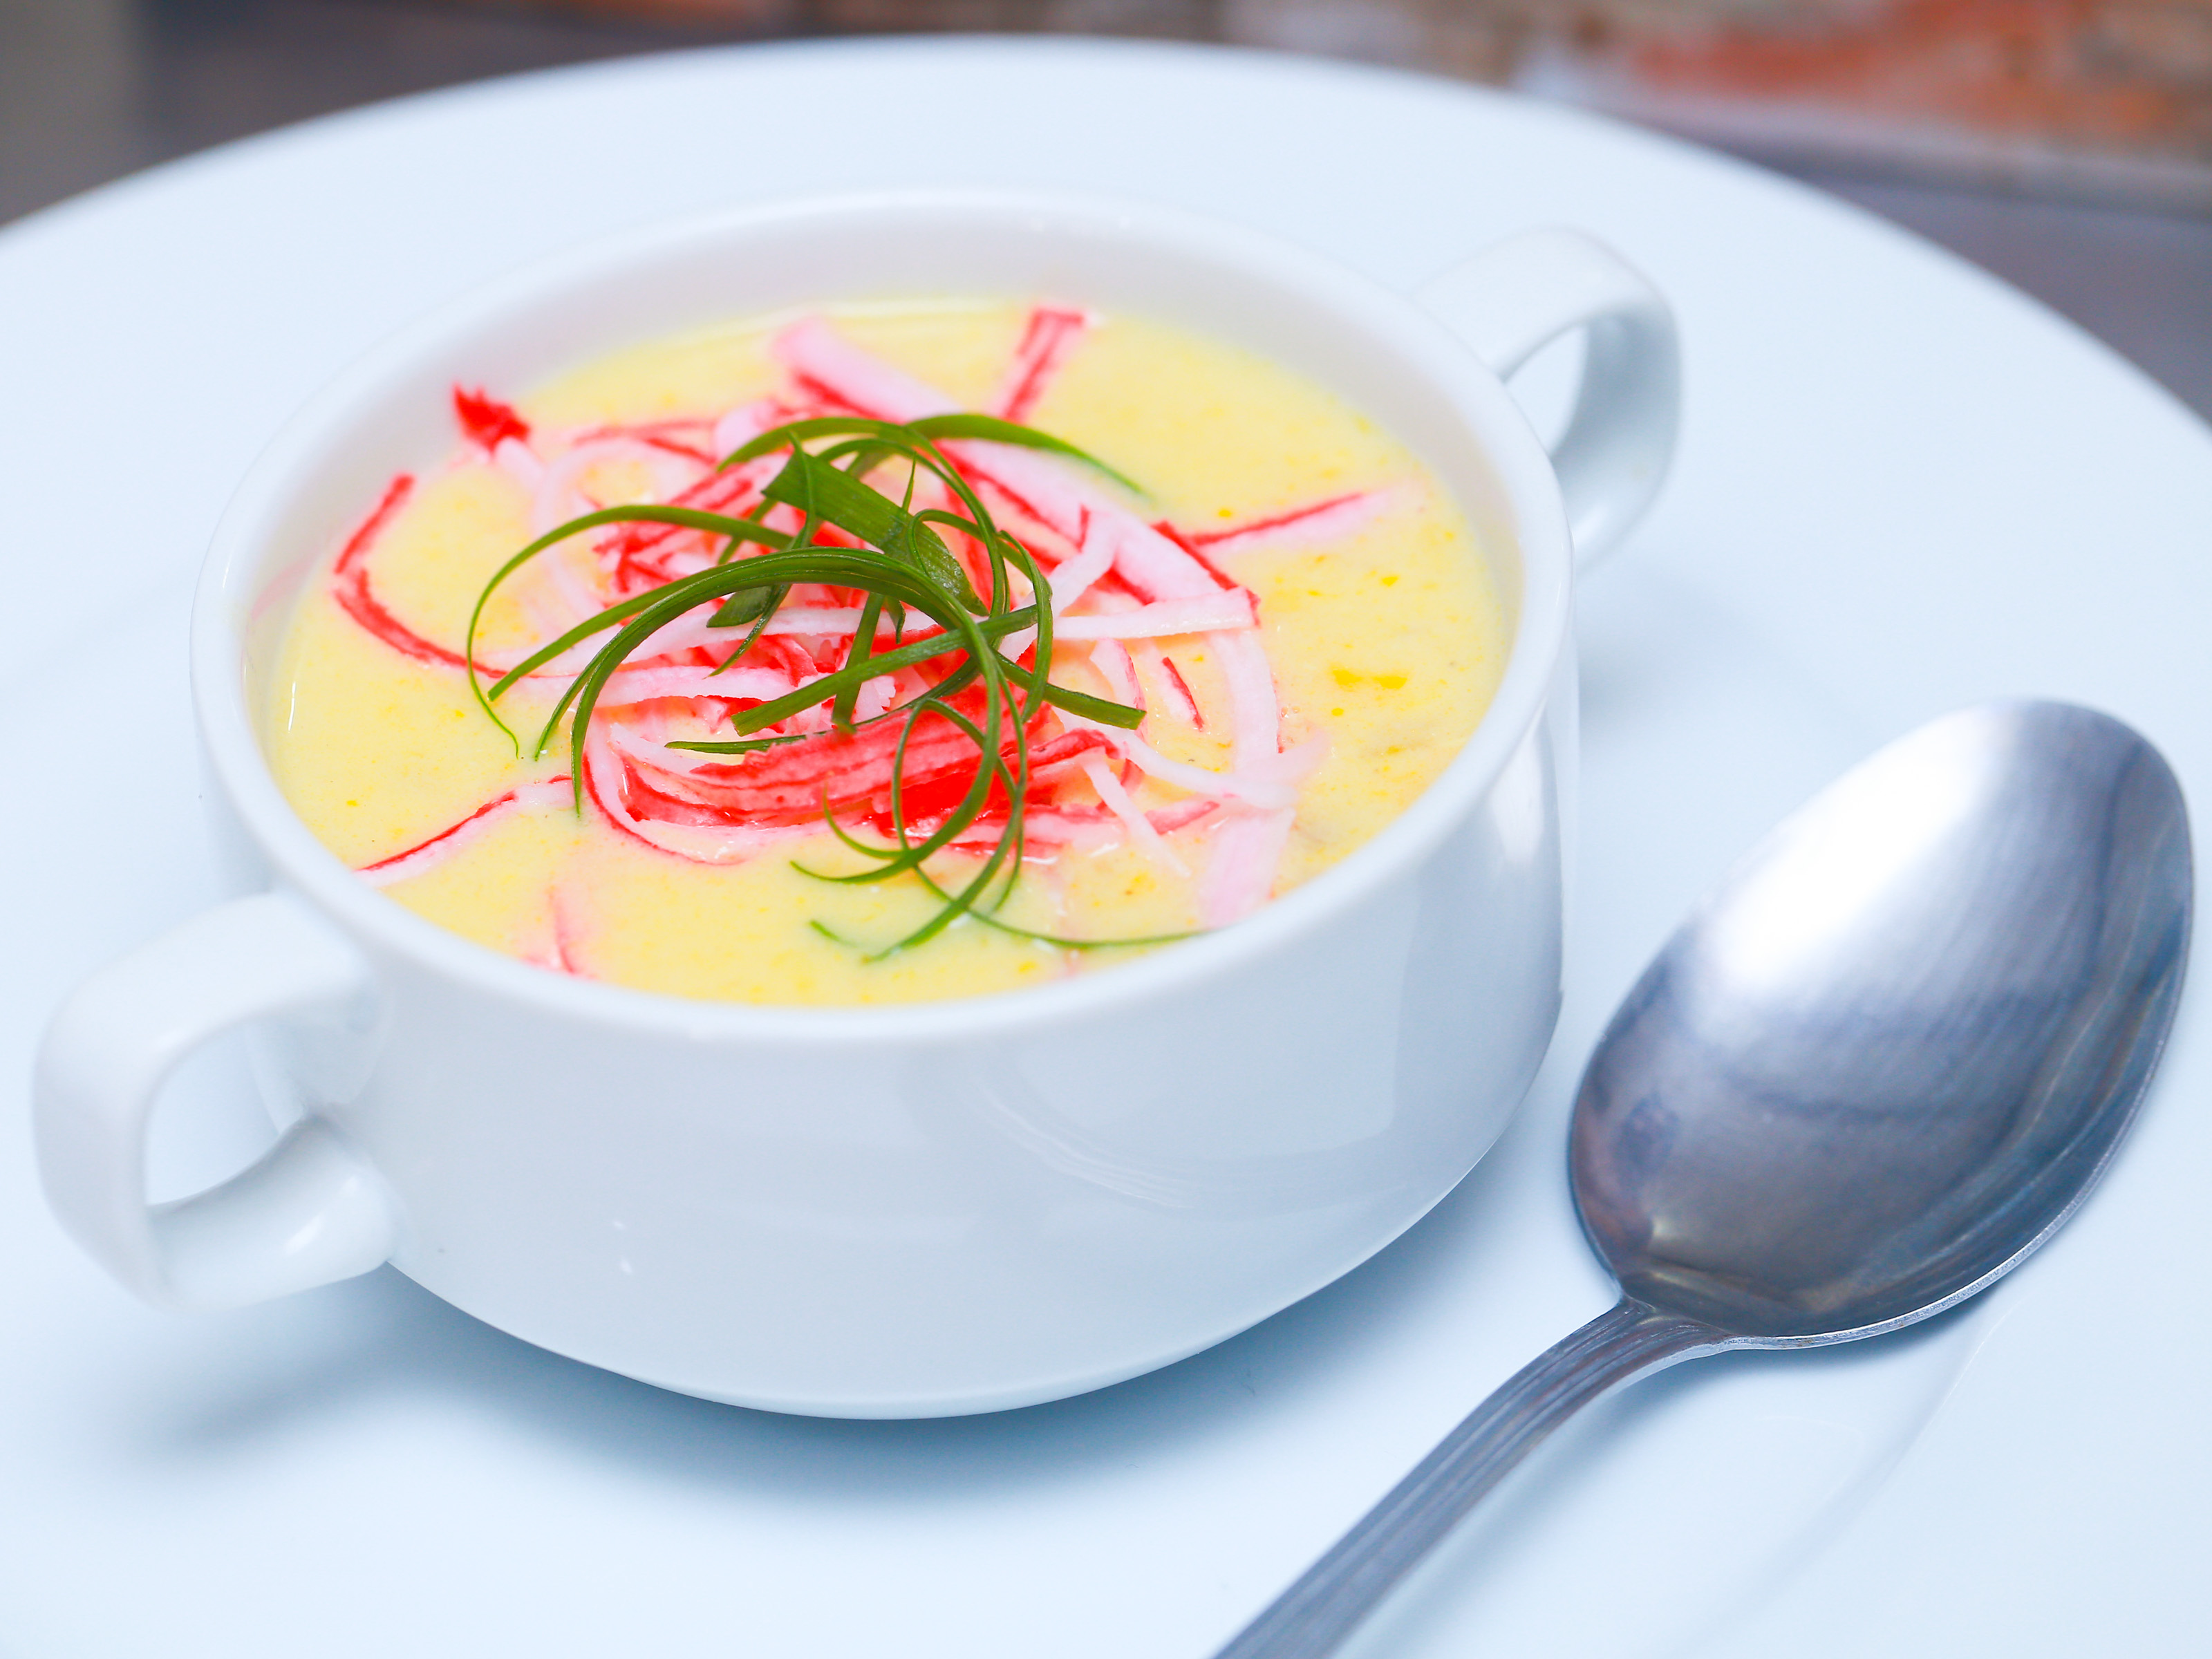 Selbstgemachte Suppe kochen  wikiHow